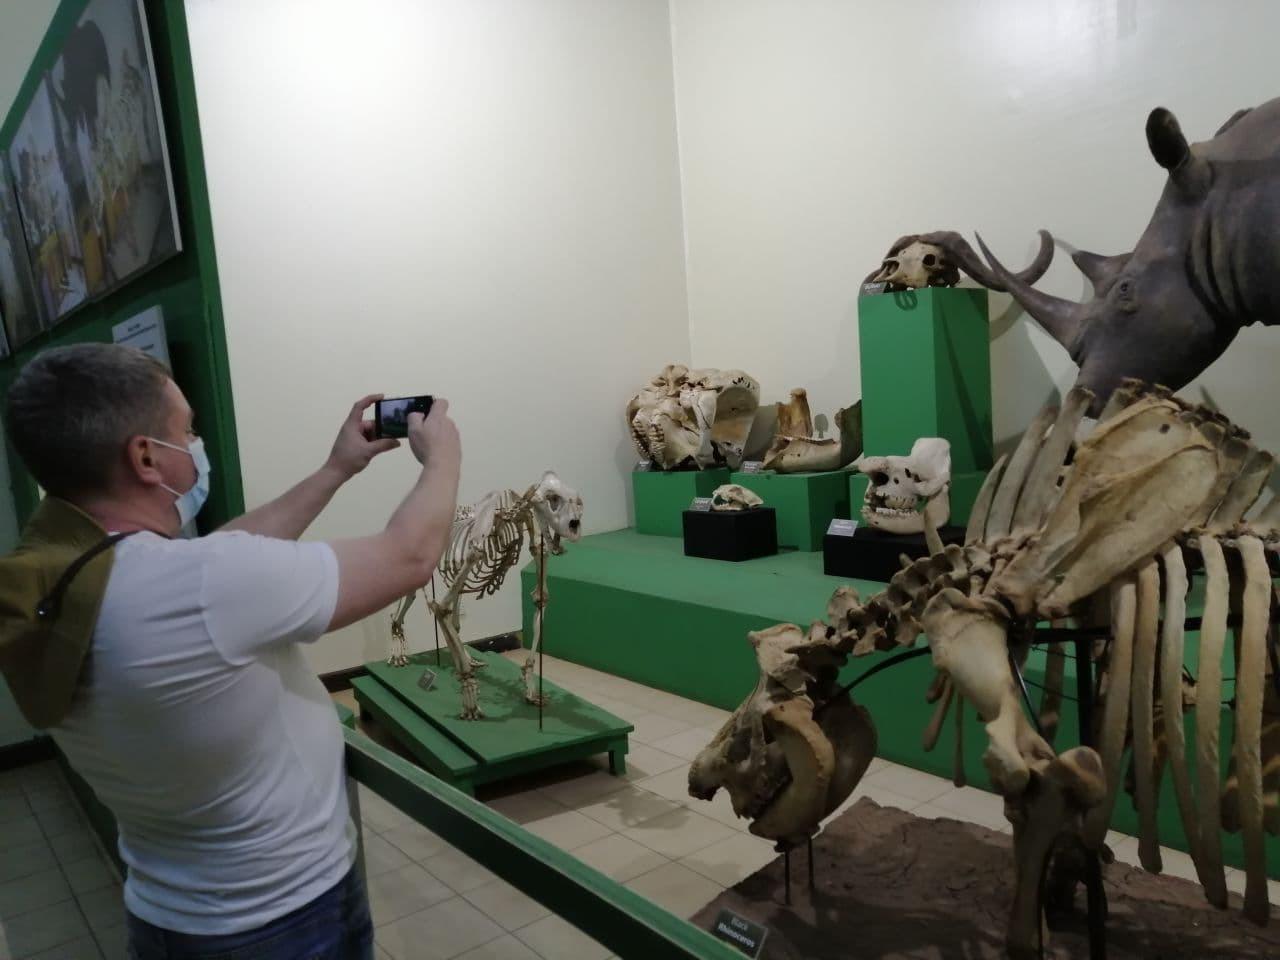 7Q7RU National Museum Nairobi, Kenya Image 11